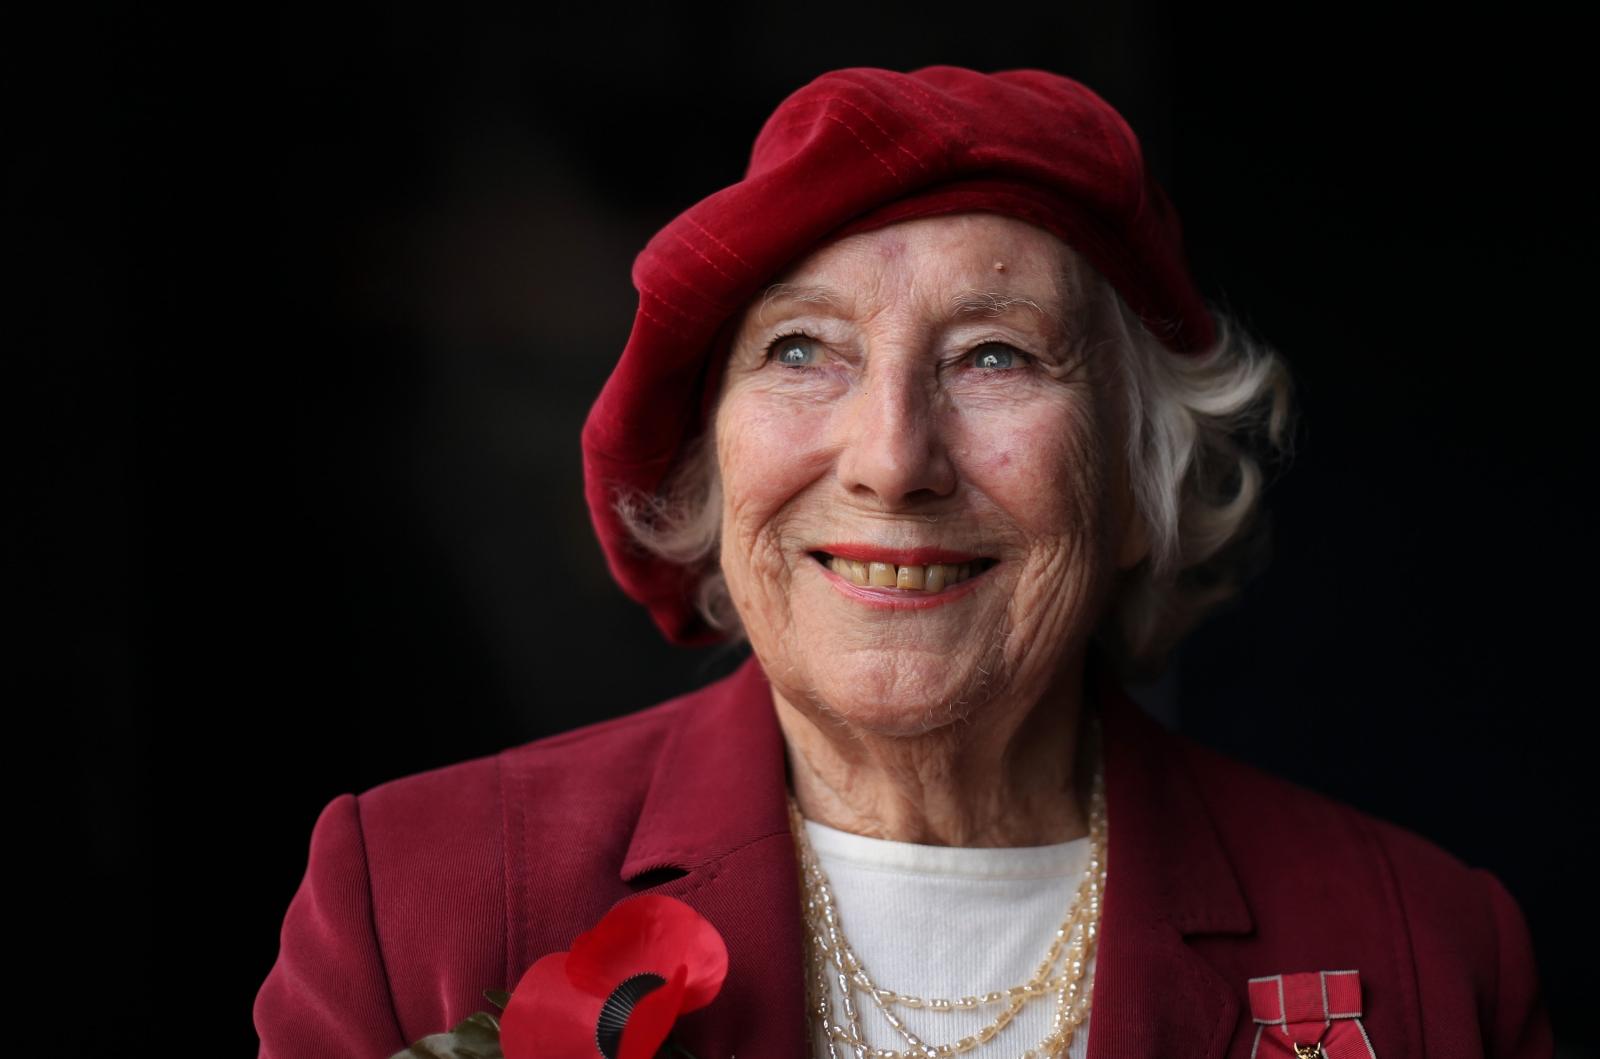 Forces sweetheart Dame Vera Lynn